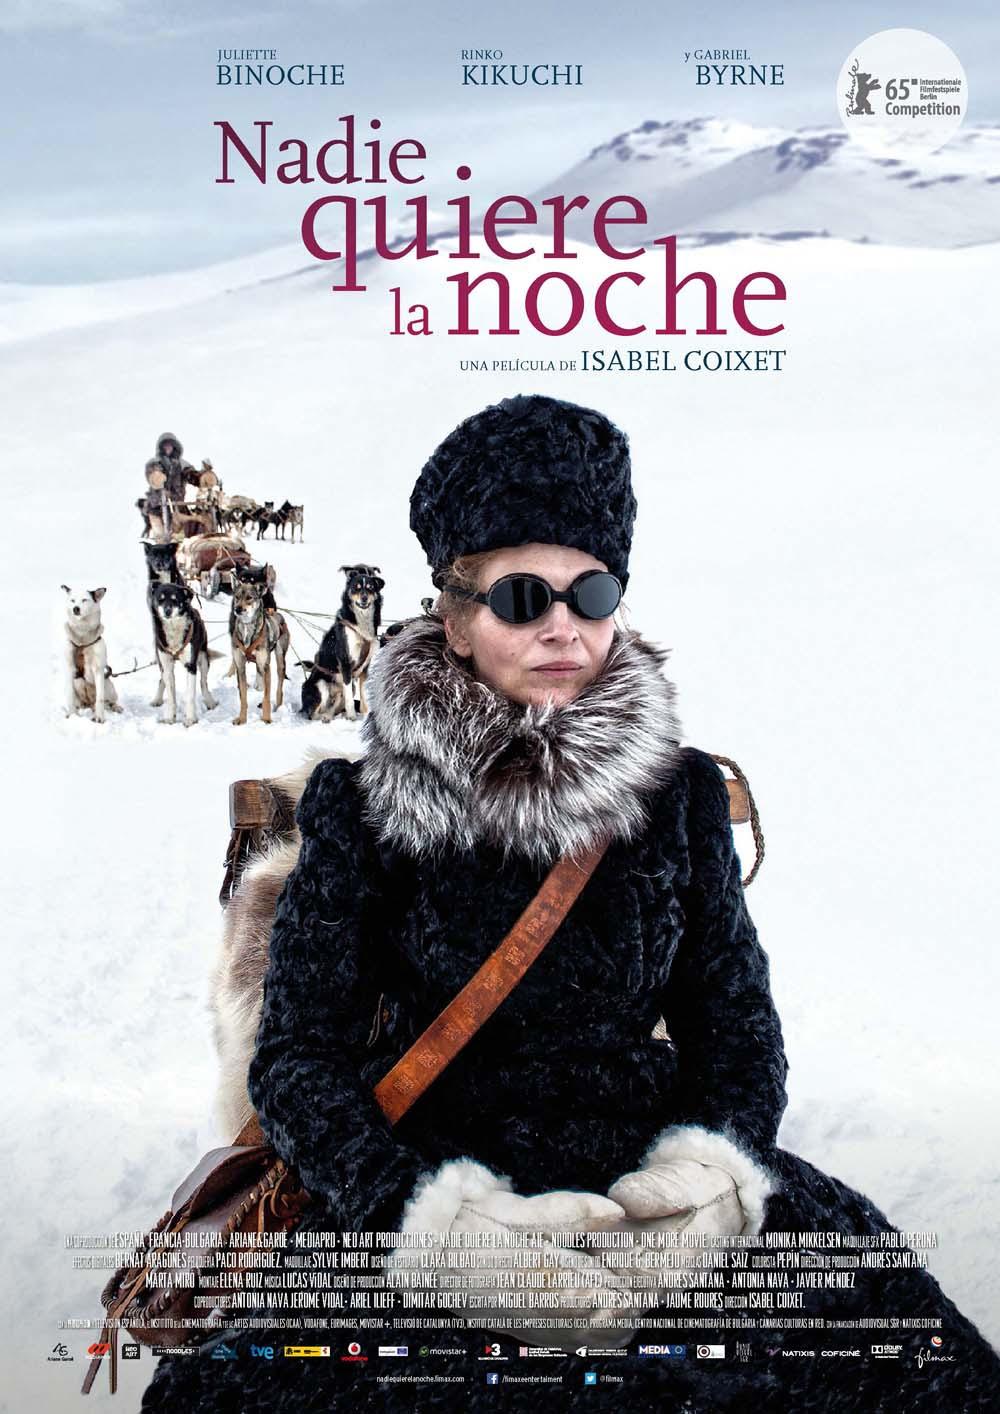 Juliette Binoche in Nadie quiere la noche (2015)